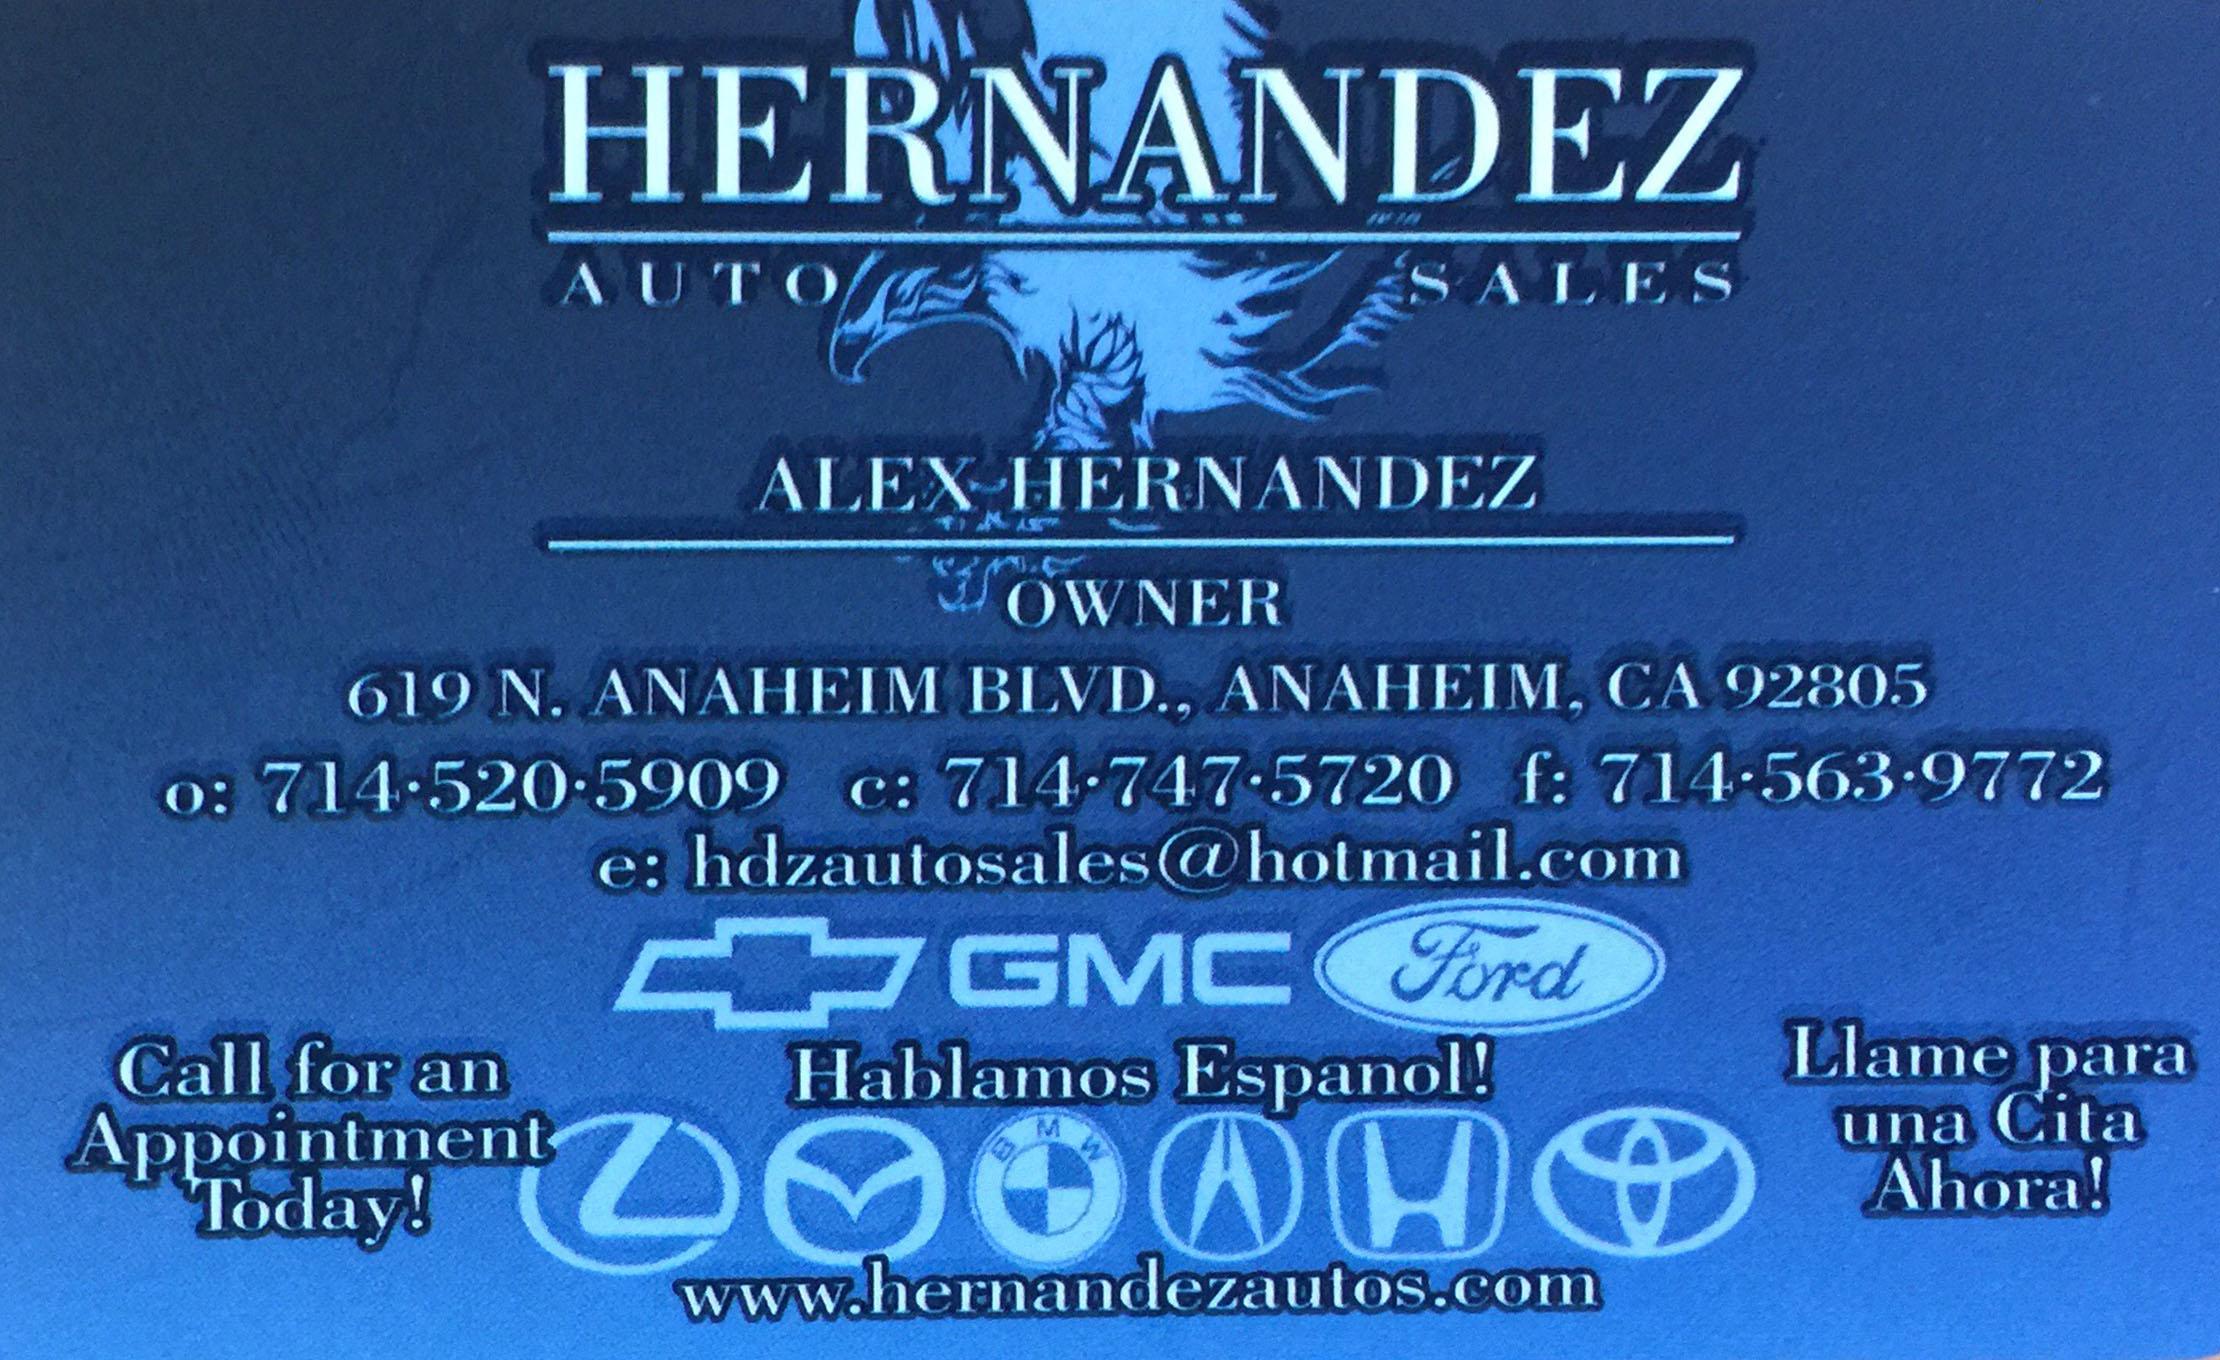 Hernandez Auto Sales